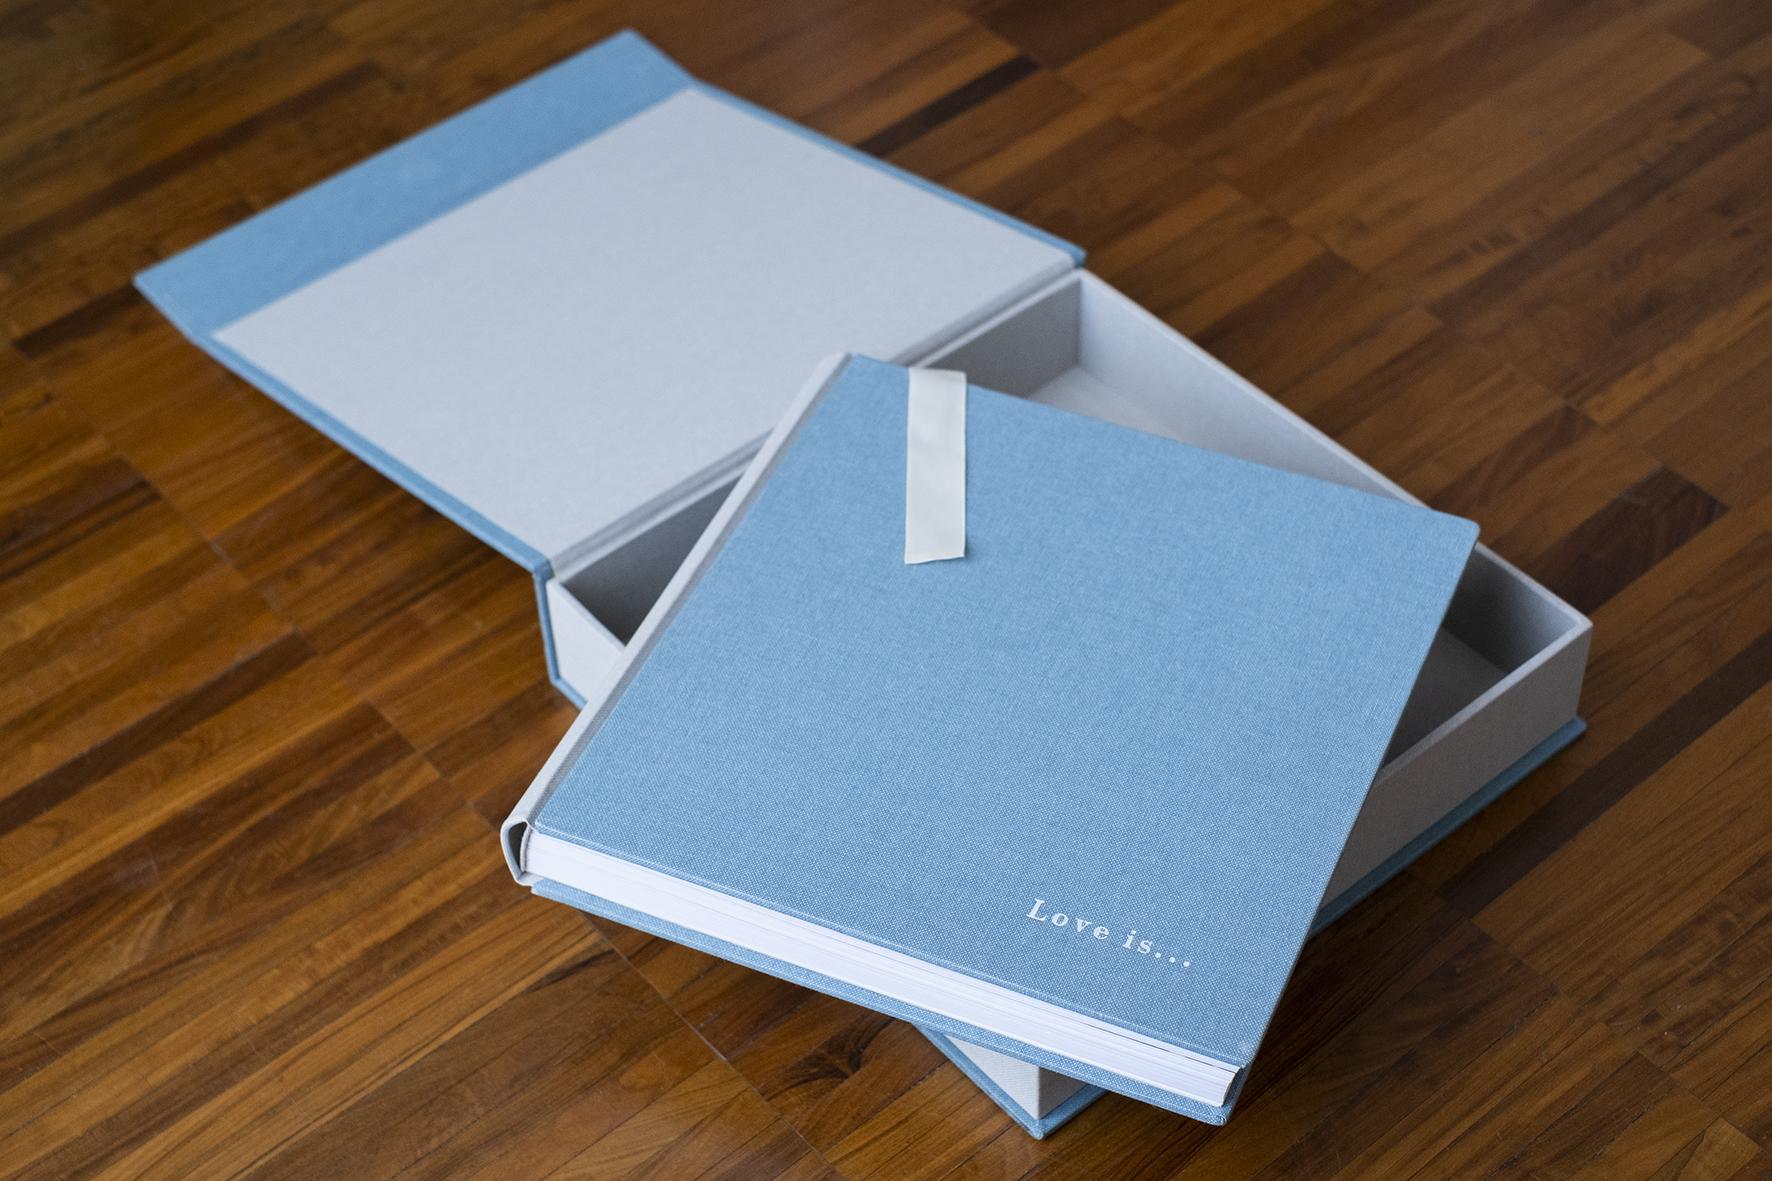 foto album digitale rilegatura artigianale tela di canapa azzurra